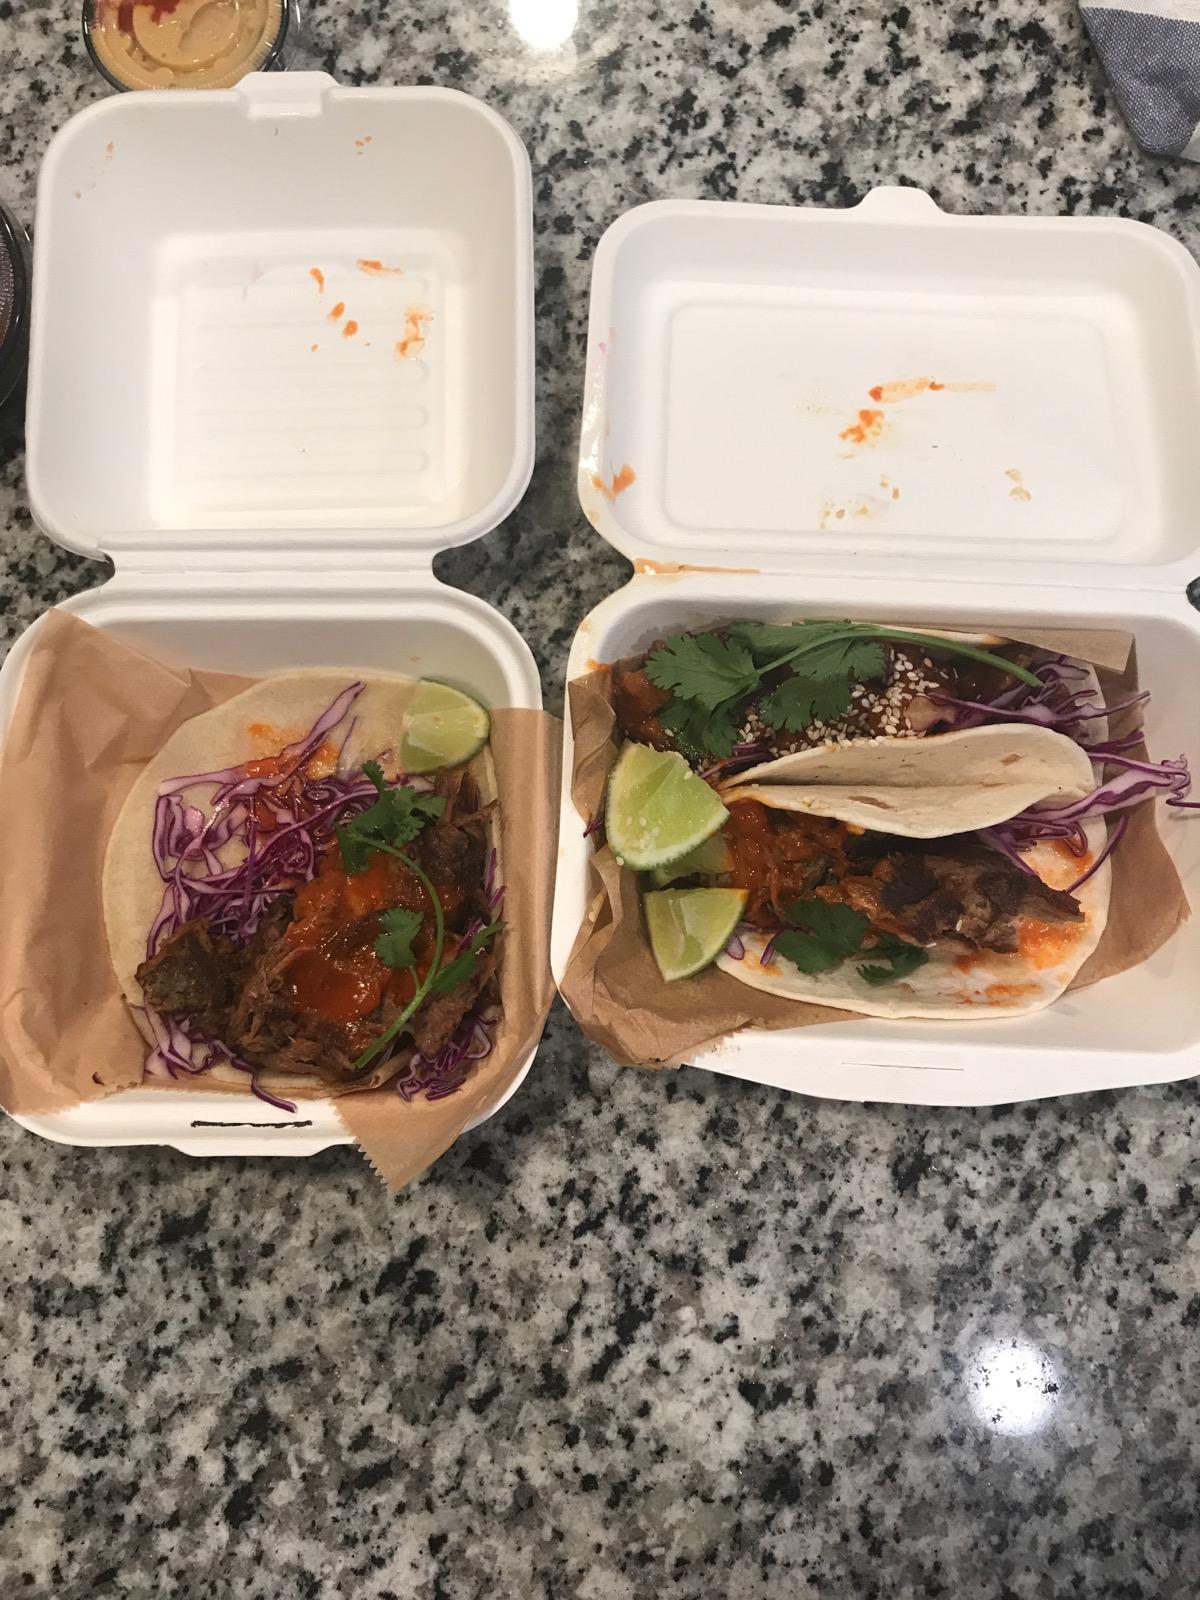 Customer #1 - Food 3